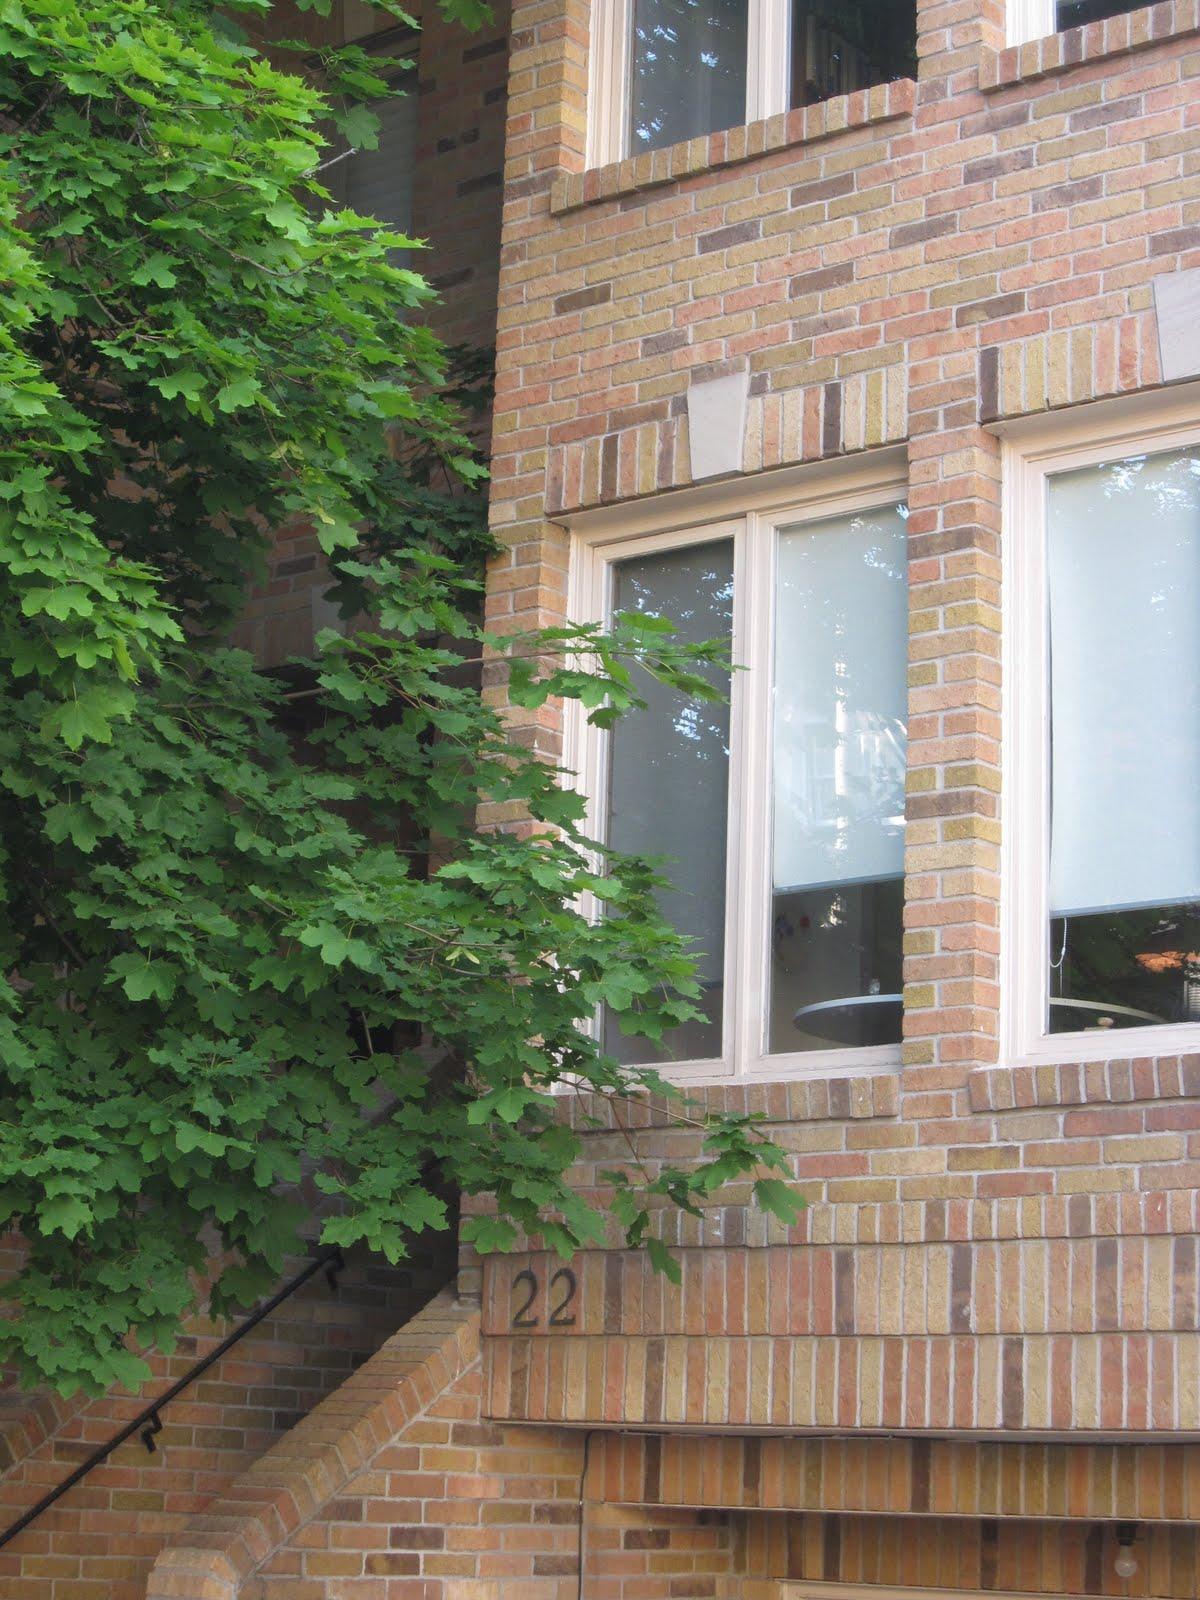 Window trim exterior brick - Similar Pages